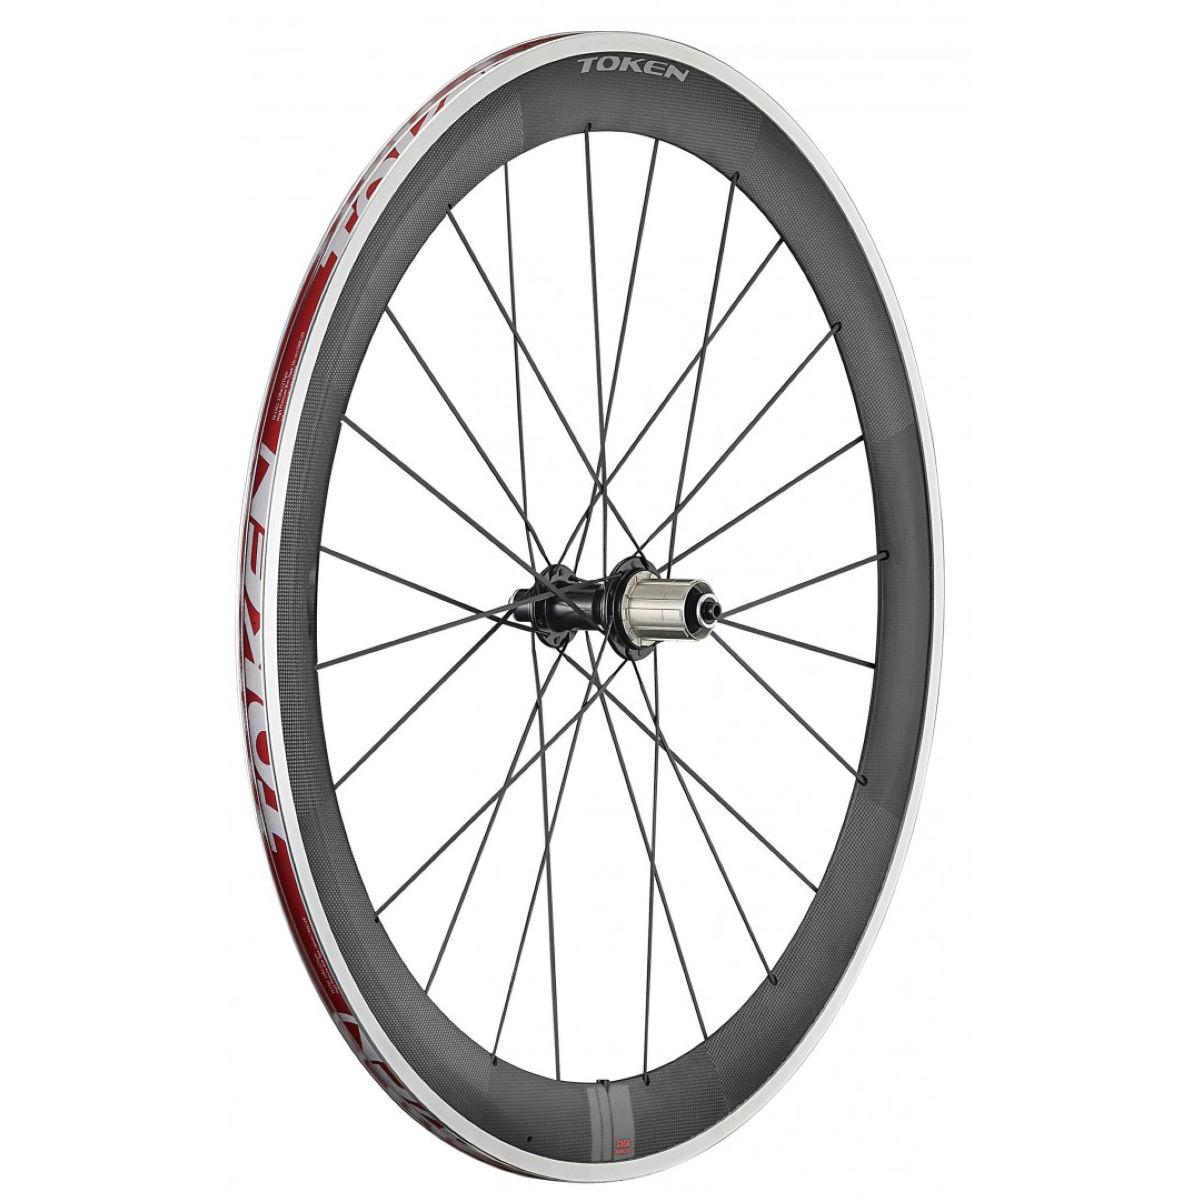 Token C55A Alloy/Carbon Clincher Wheelset Performance Wheels